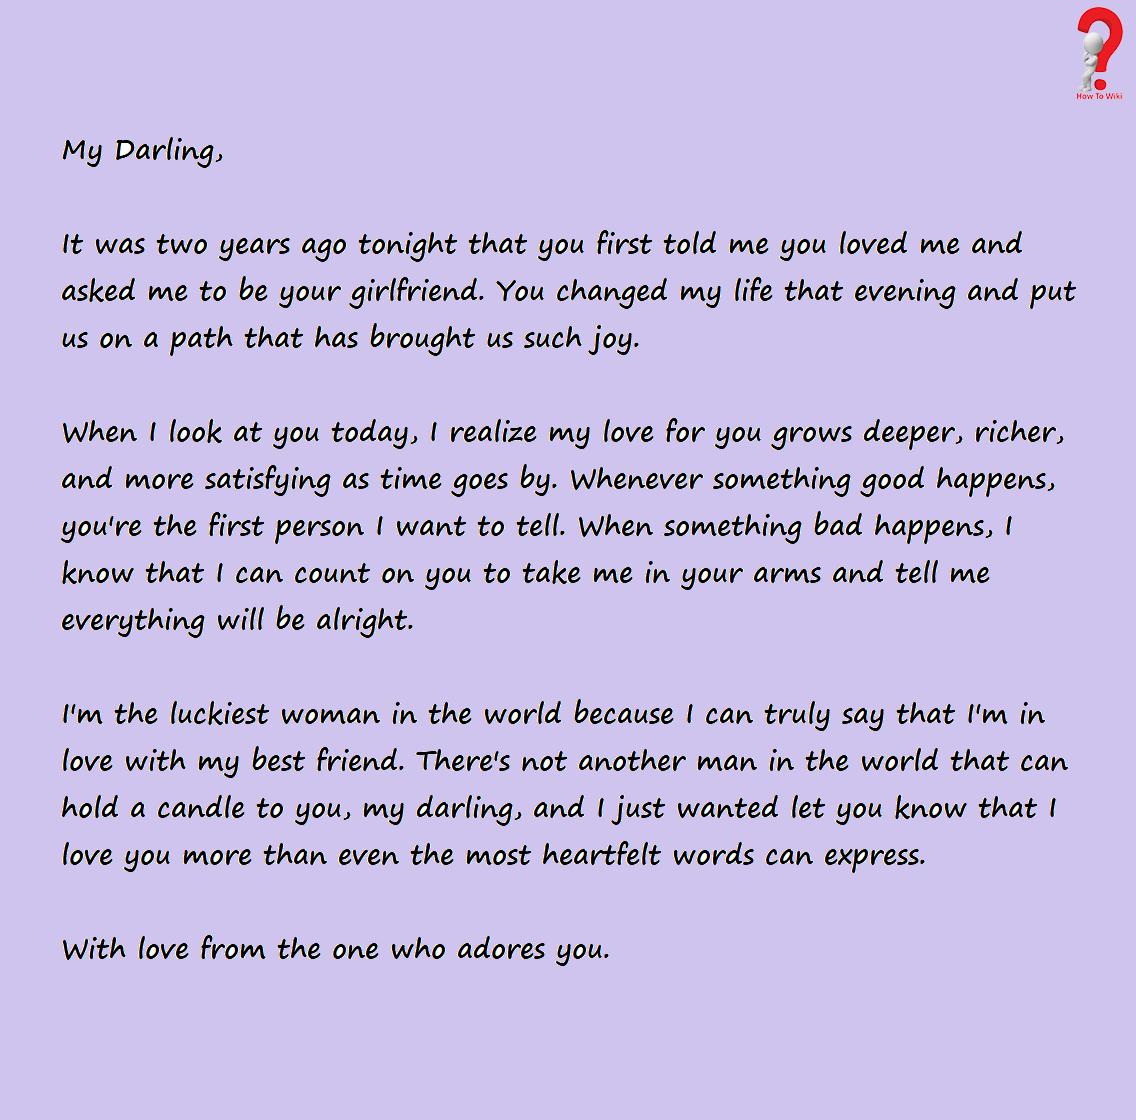 Love Letter to Boyfriend Luxury How to Write Love Letter for Boyfriend